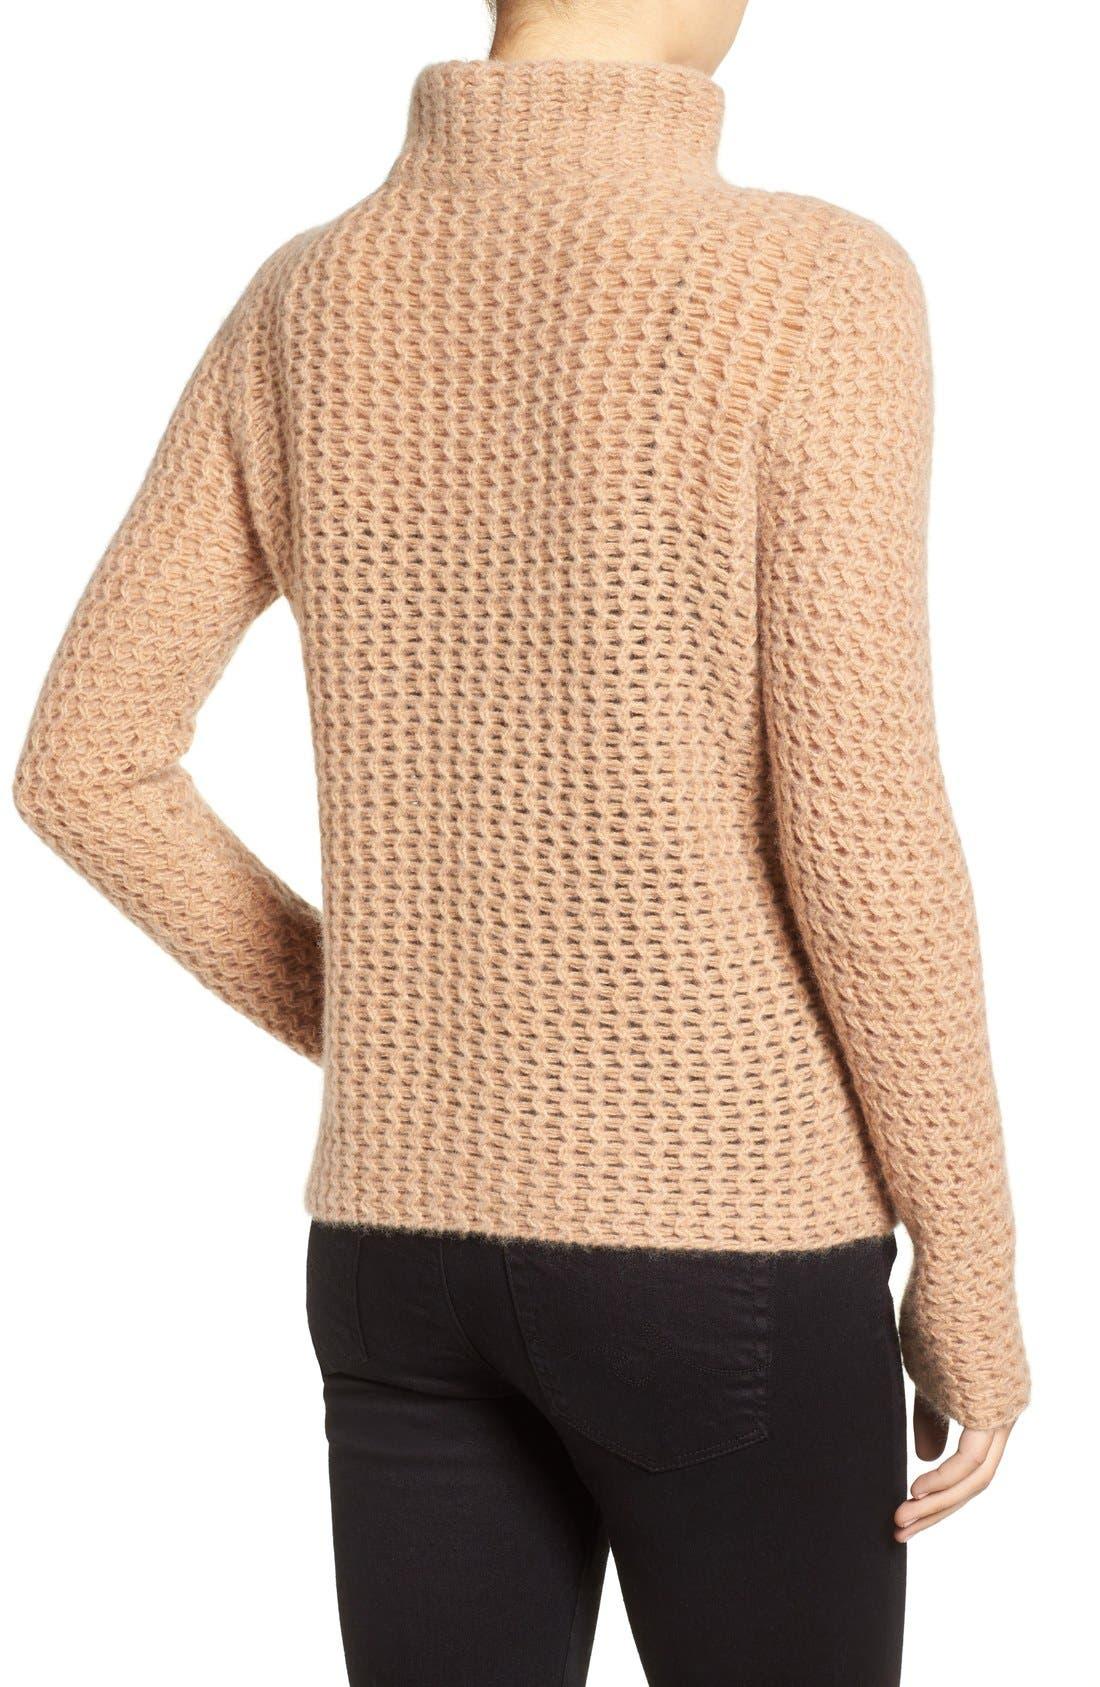 Stitch Detail Cashmere Mock Neck Sweater,                             Alternate thumbnail 5, color,